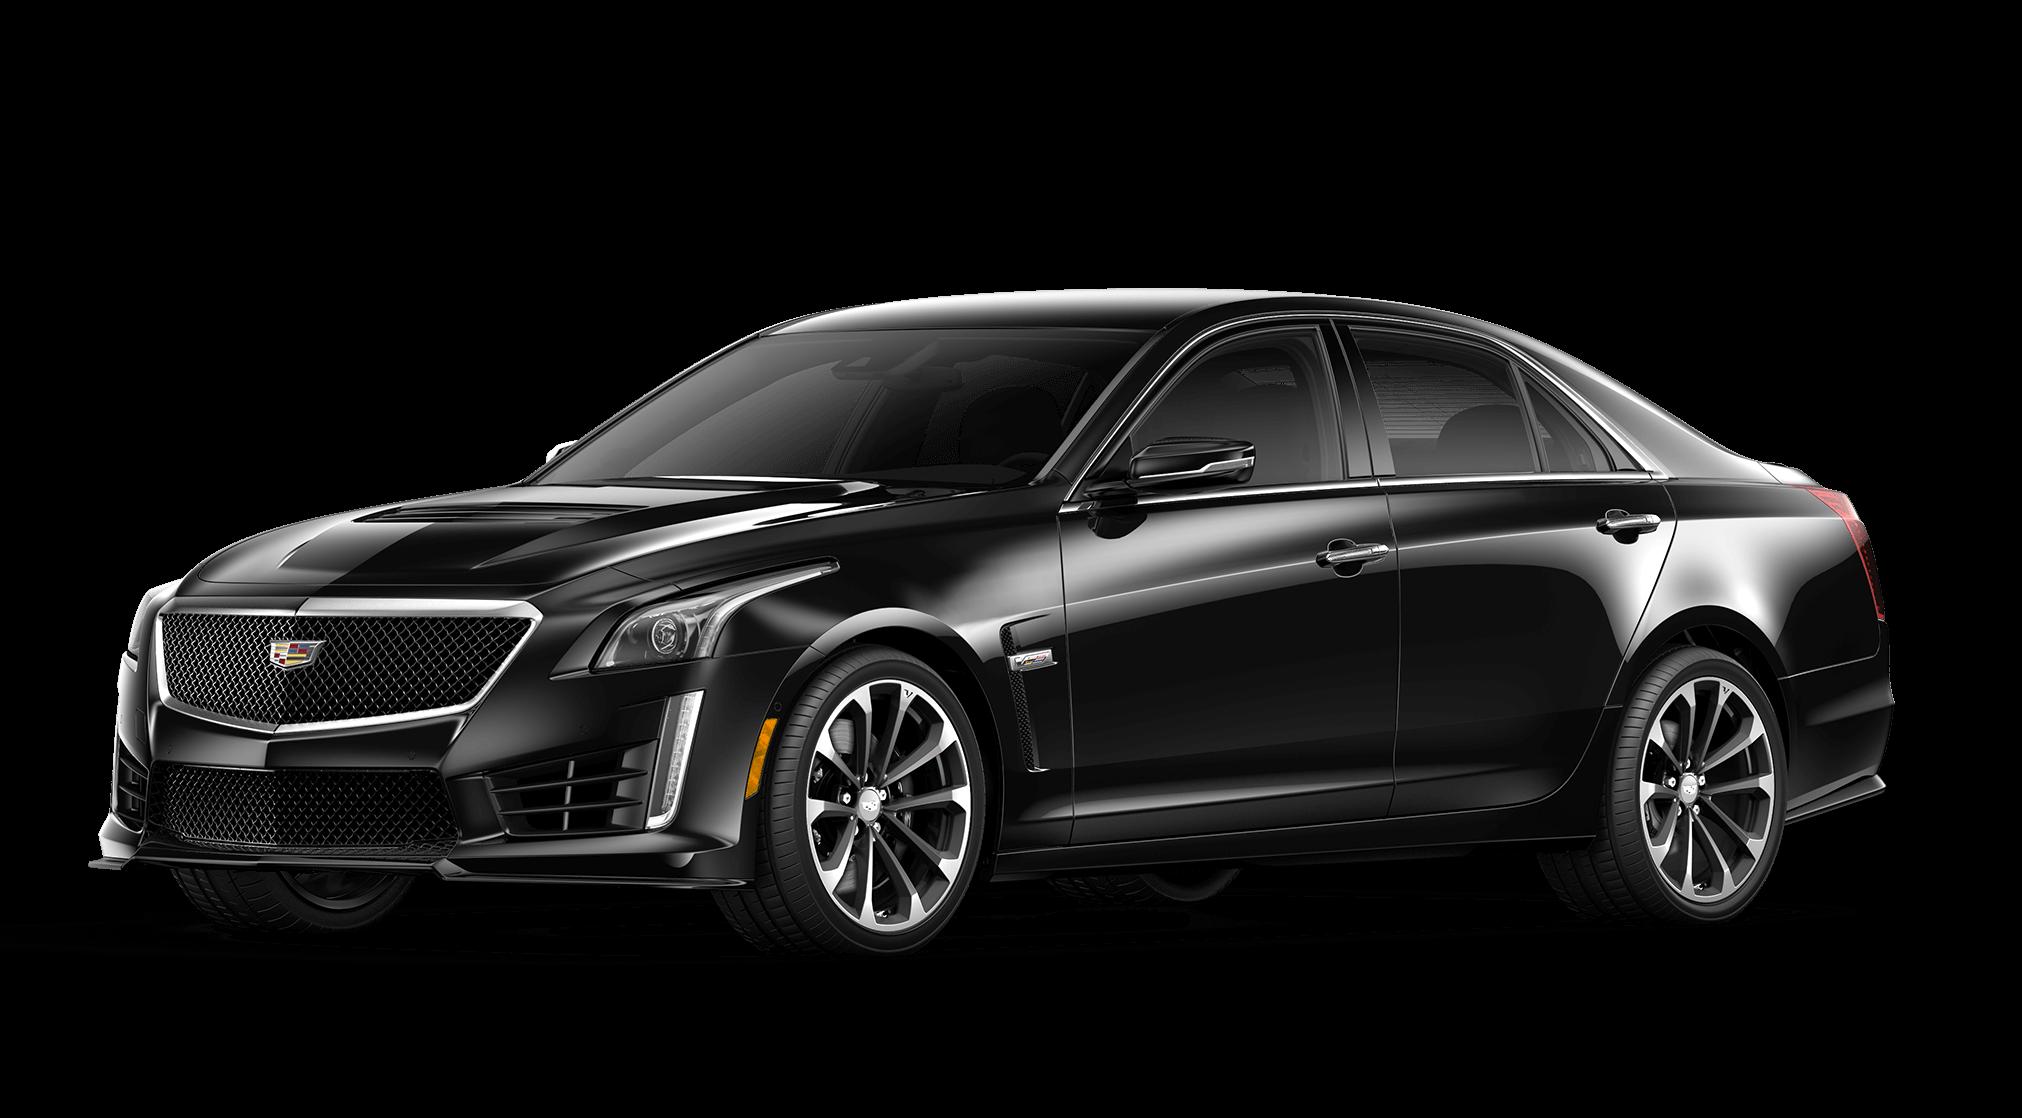 Cadillac CTS-V Black Raven